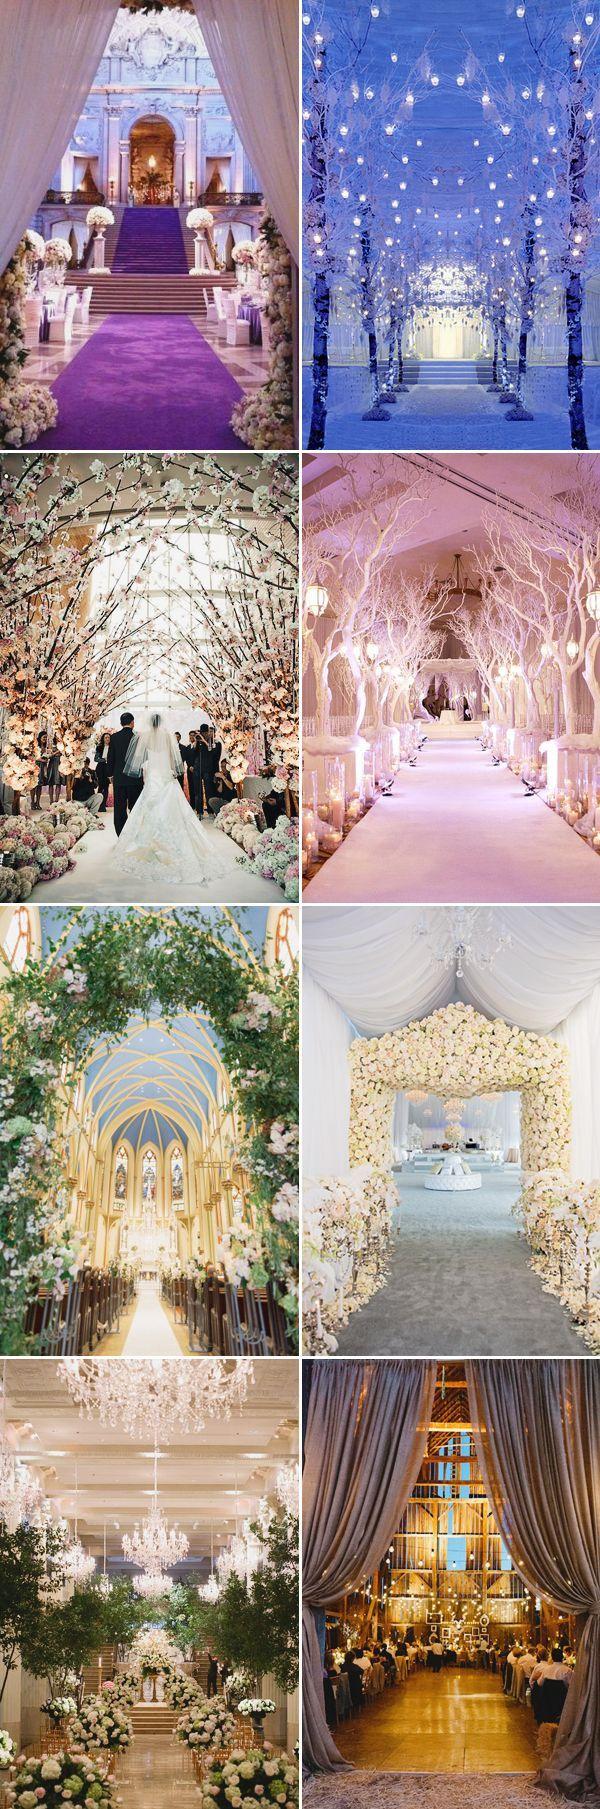 Making a Beautiful Entrance! 26 Creative Wedding Entrance Decor Ideas! Indoor entrance!